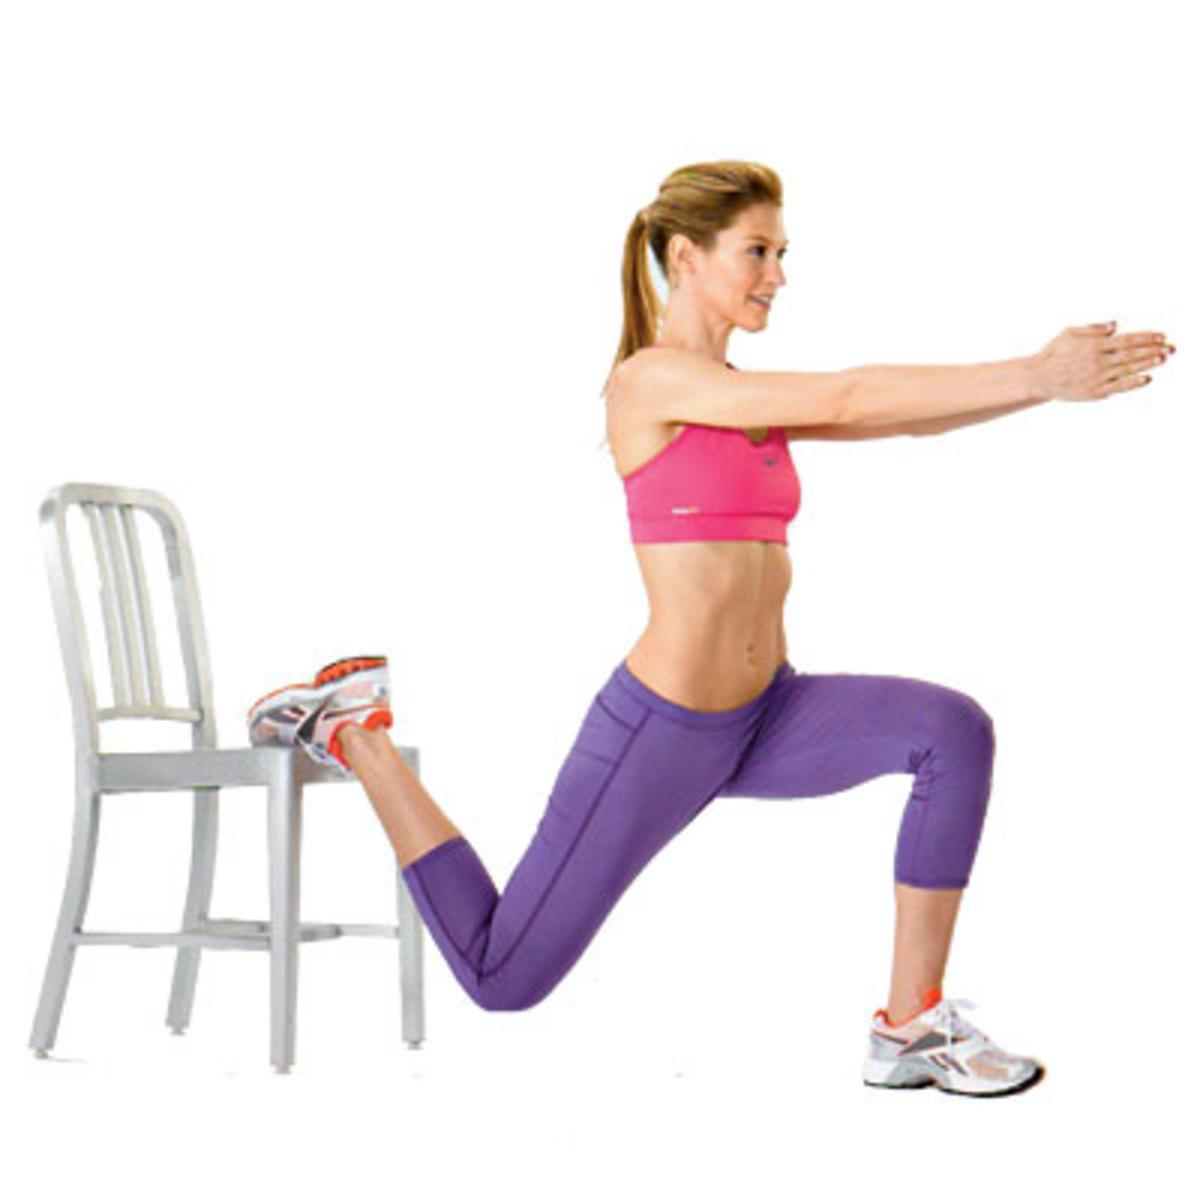 One Leg Squat - Split Squat